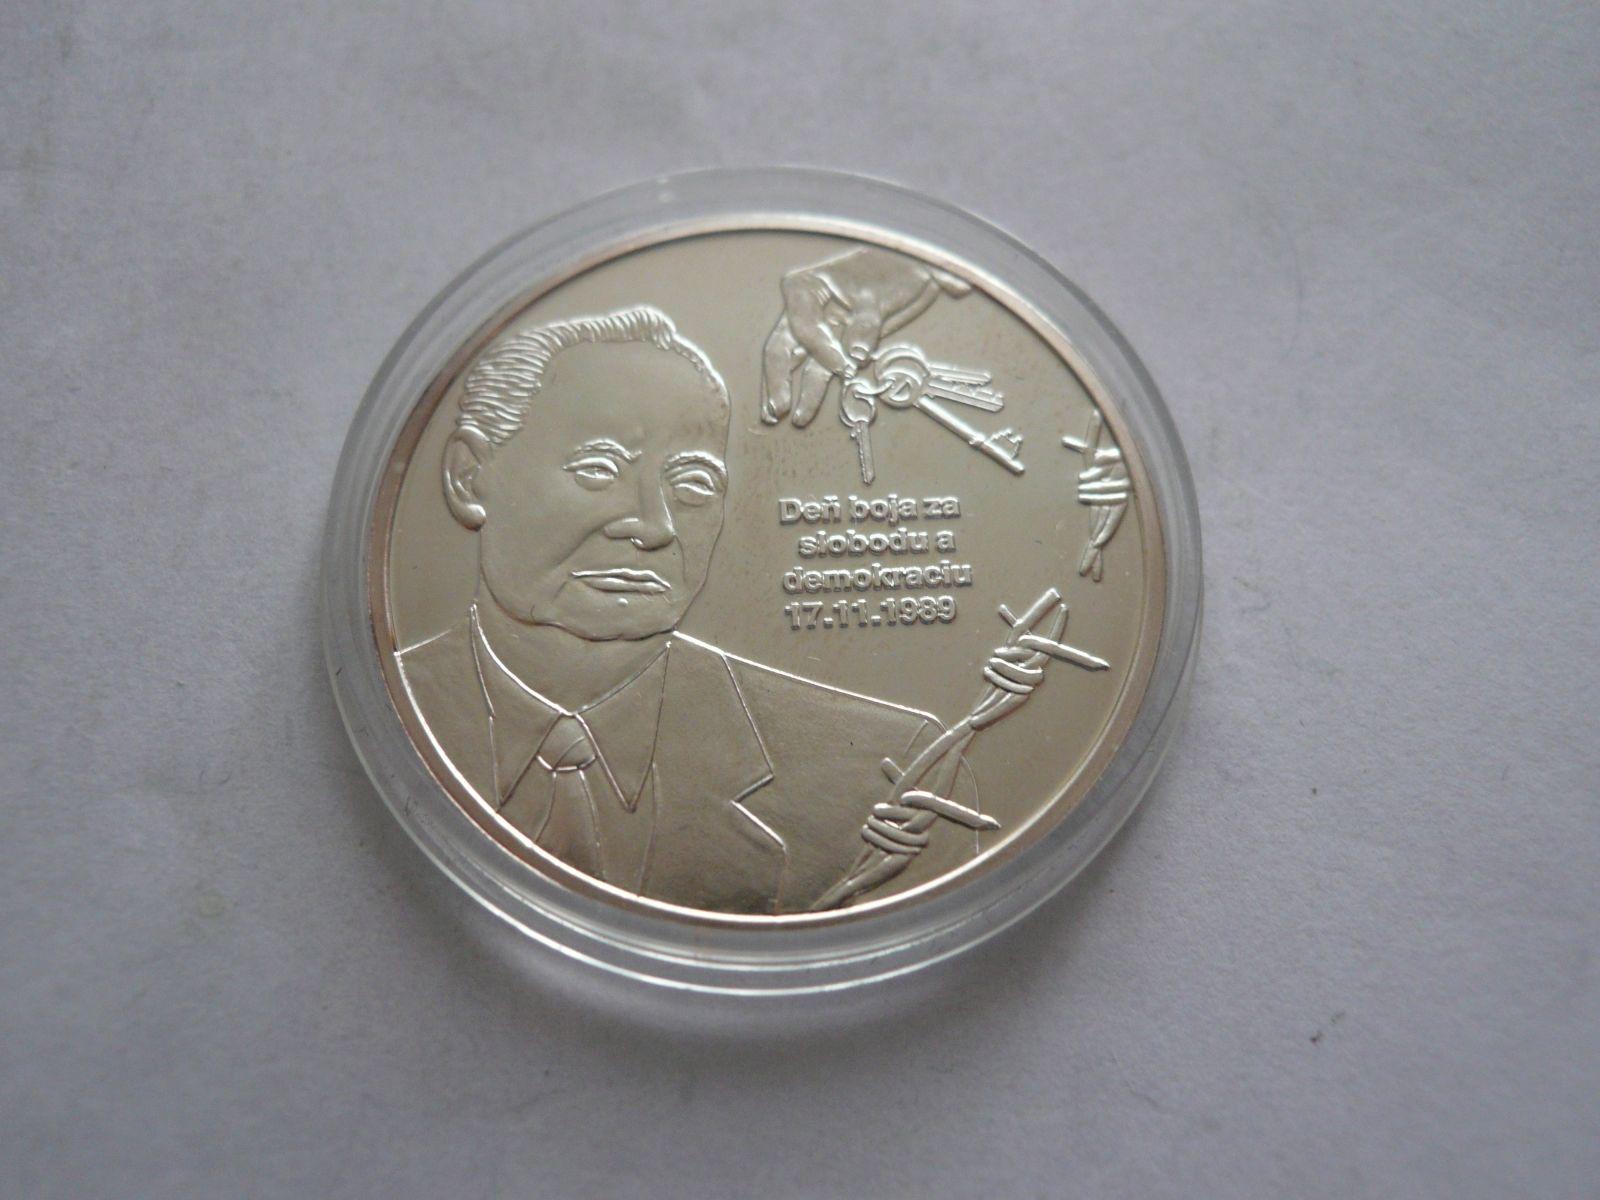 medaile Alexander Dubček, Ag, Historické momenty, ČSR